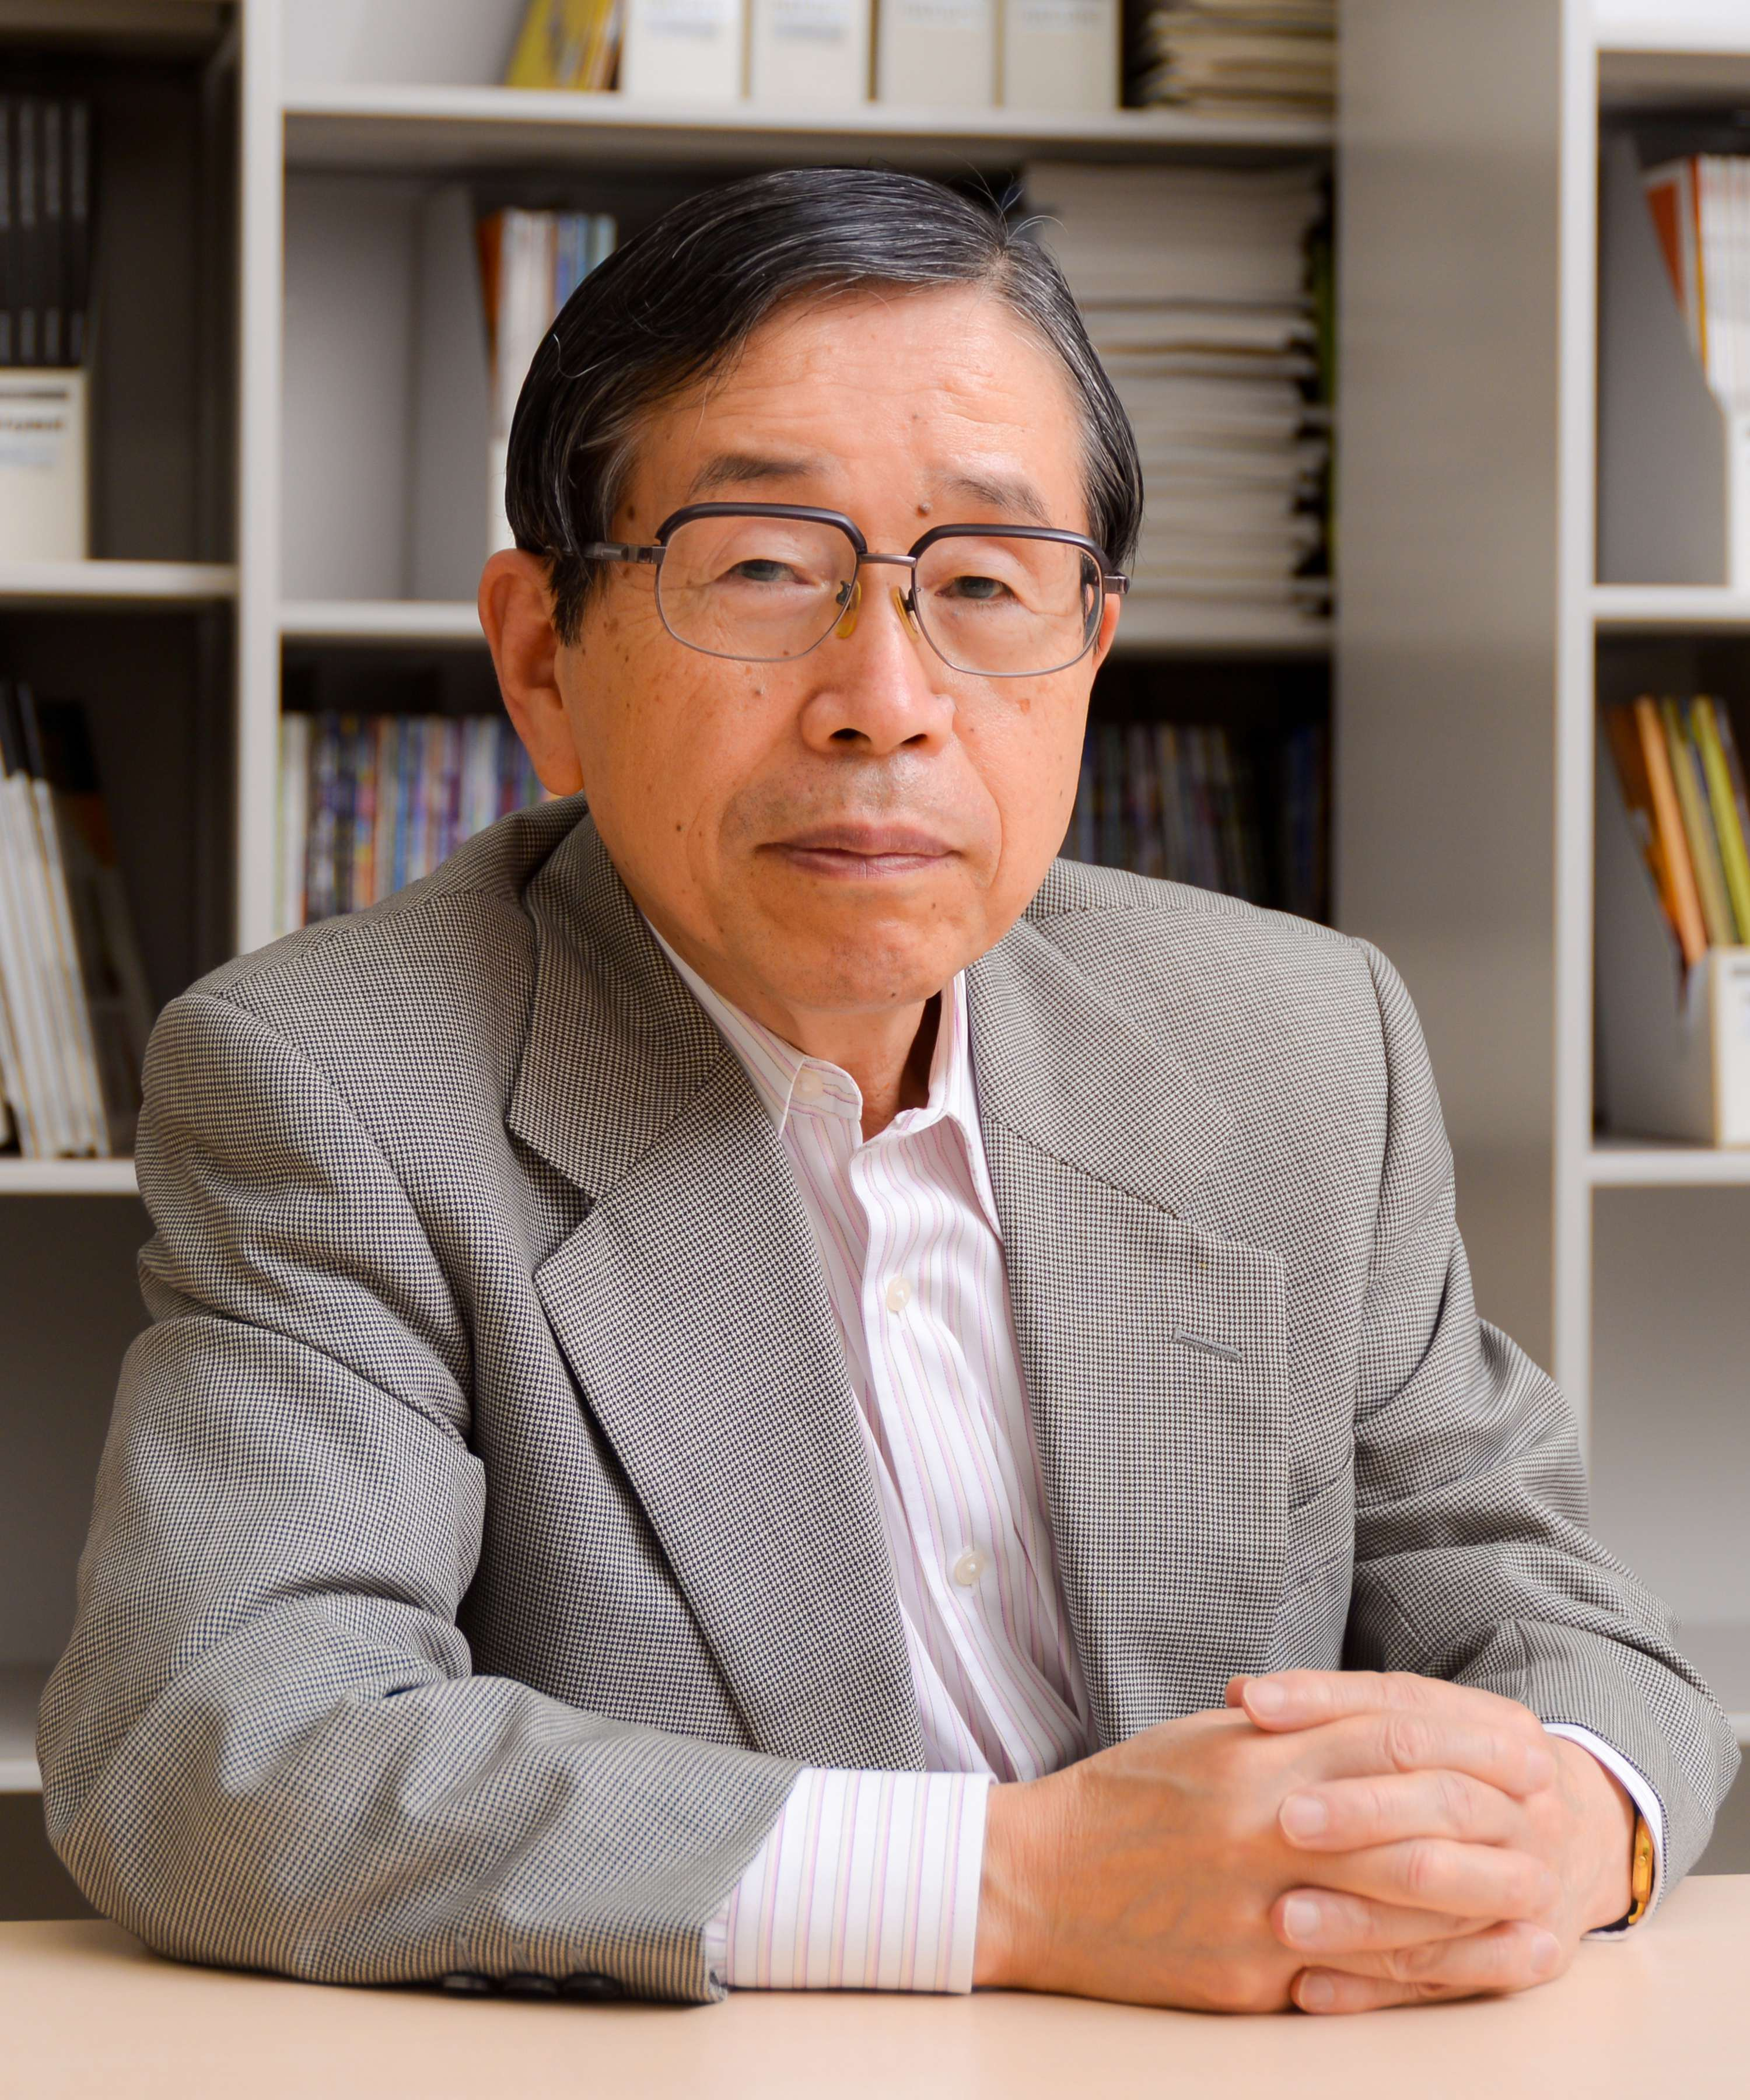 Dr. Tsumoto